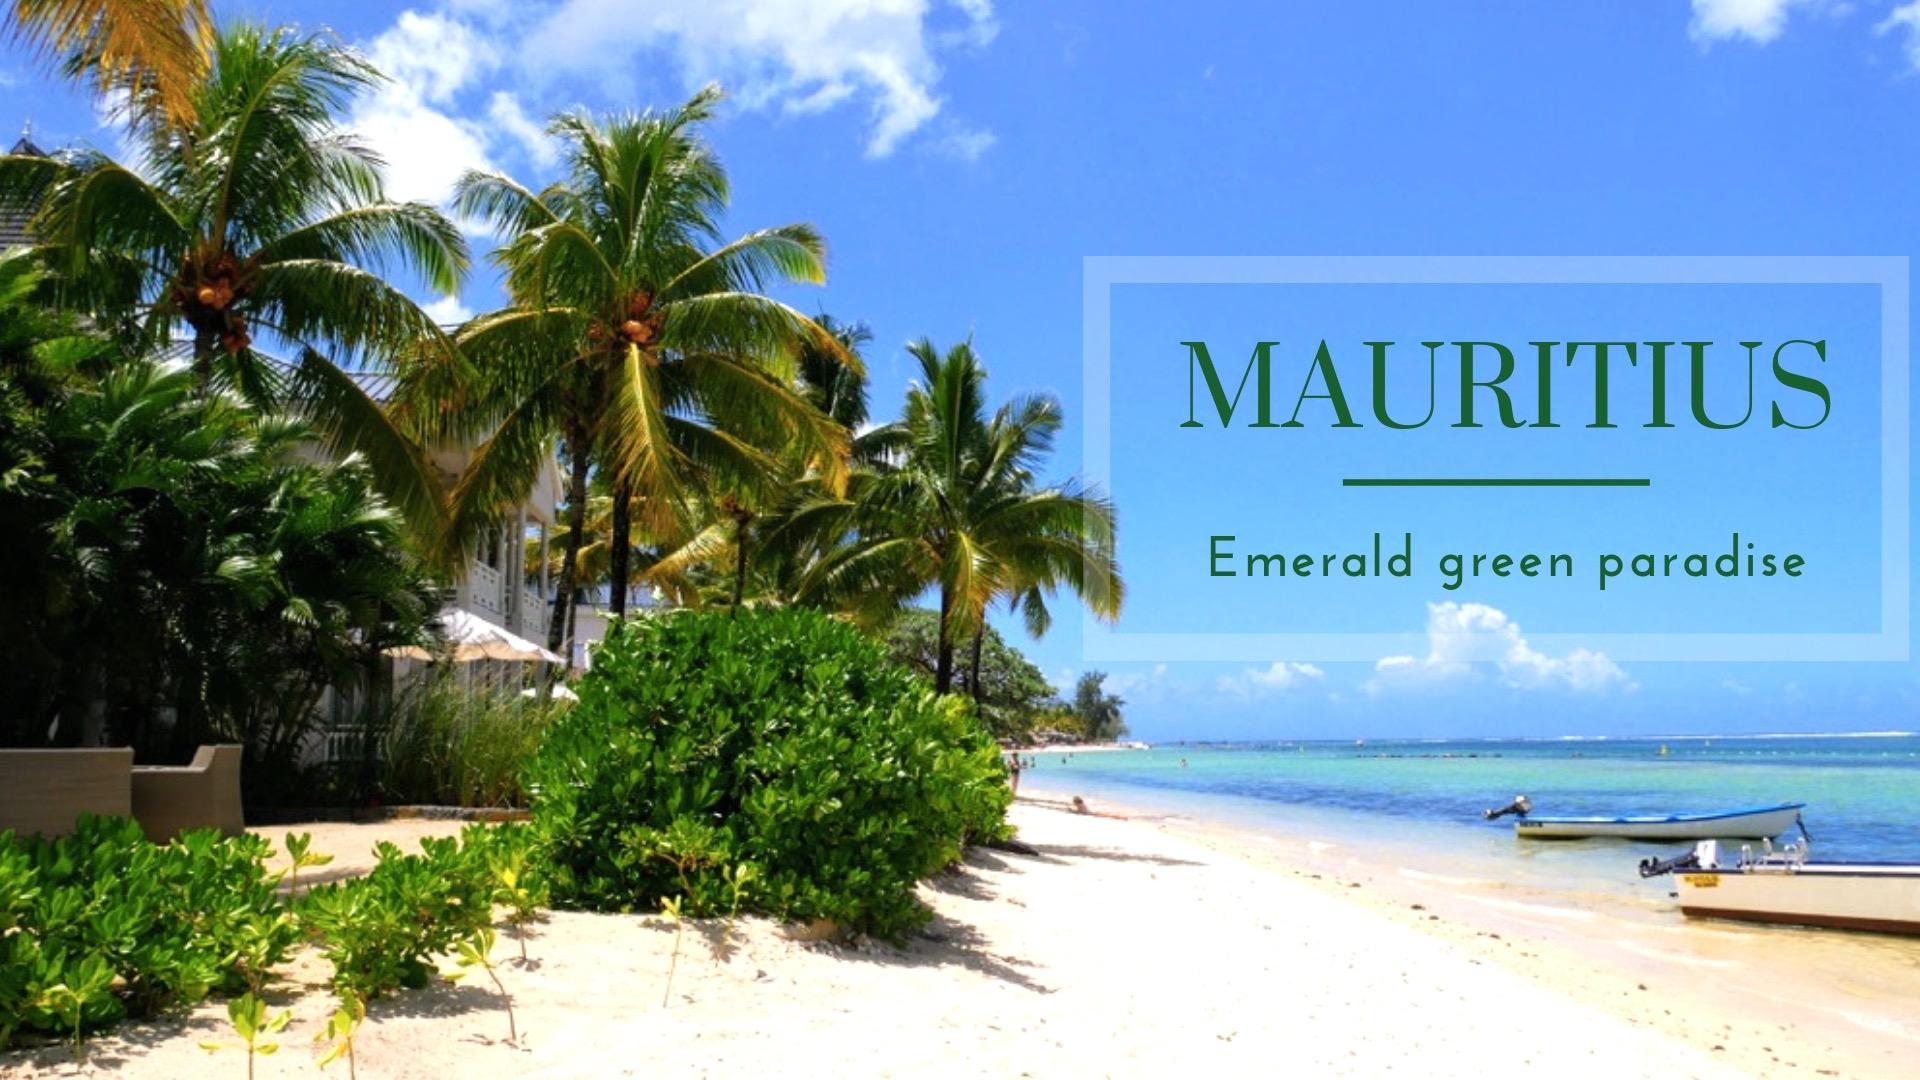 Mauritius - Emerald green paradise - Get inspiration here